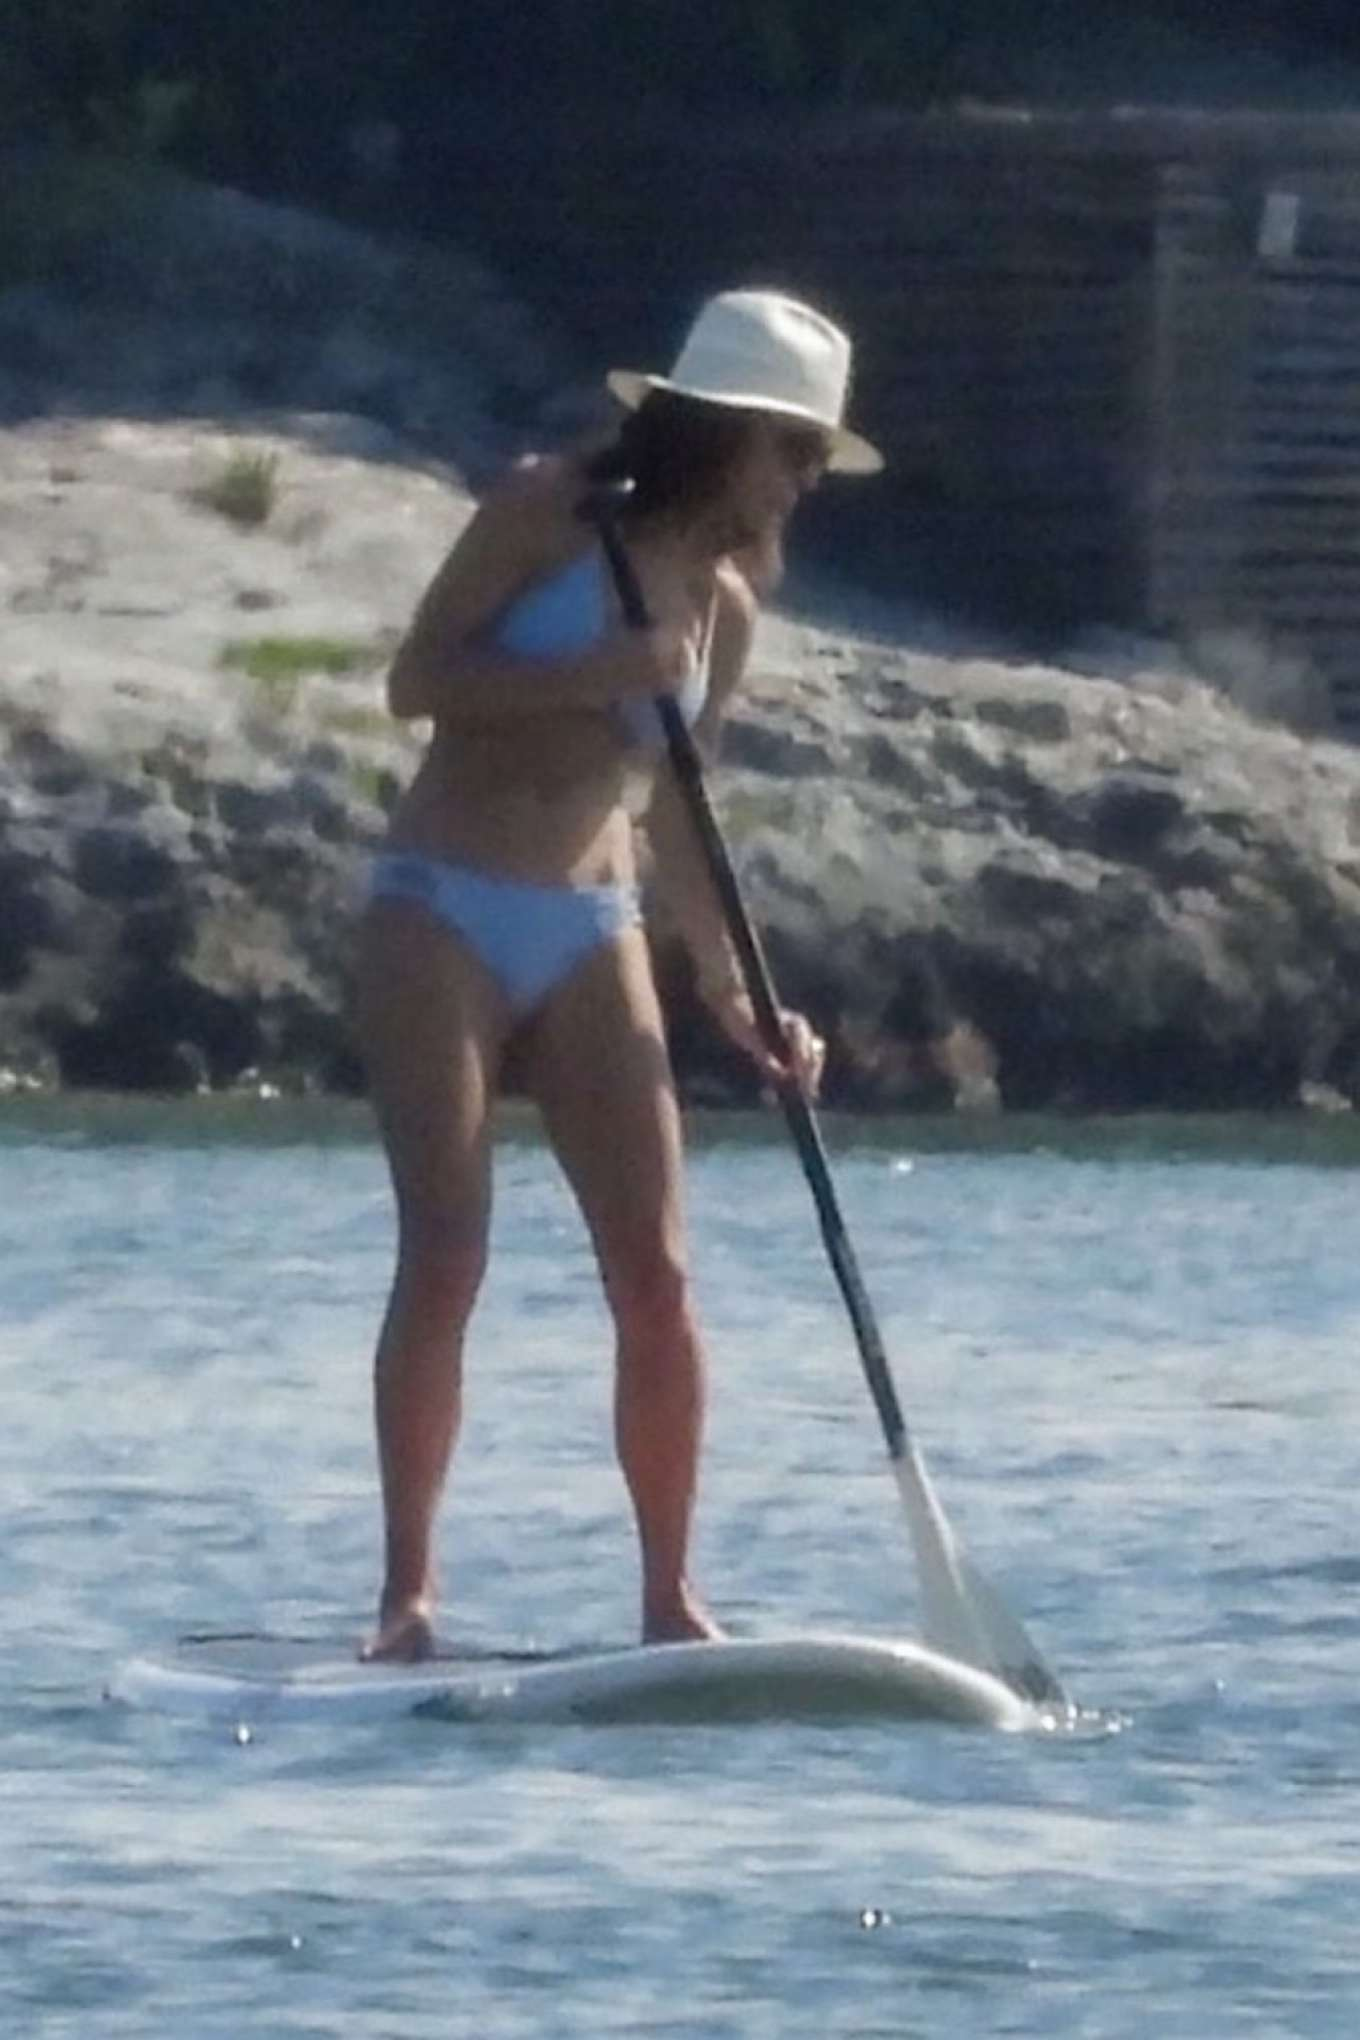 Bethenny Frankel in Bikini Paddleboarding at a beach in Cancun